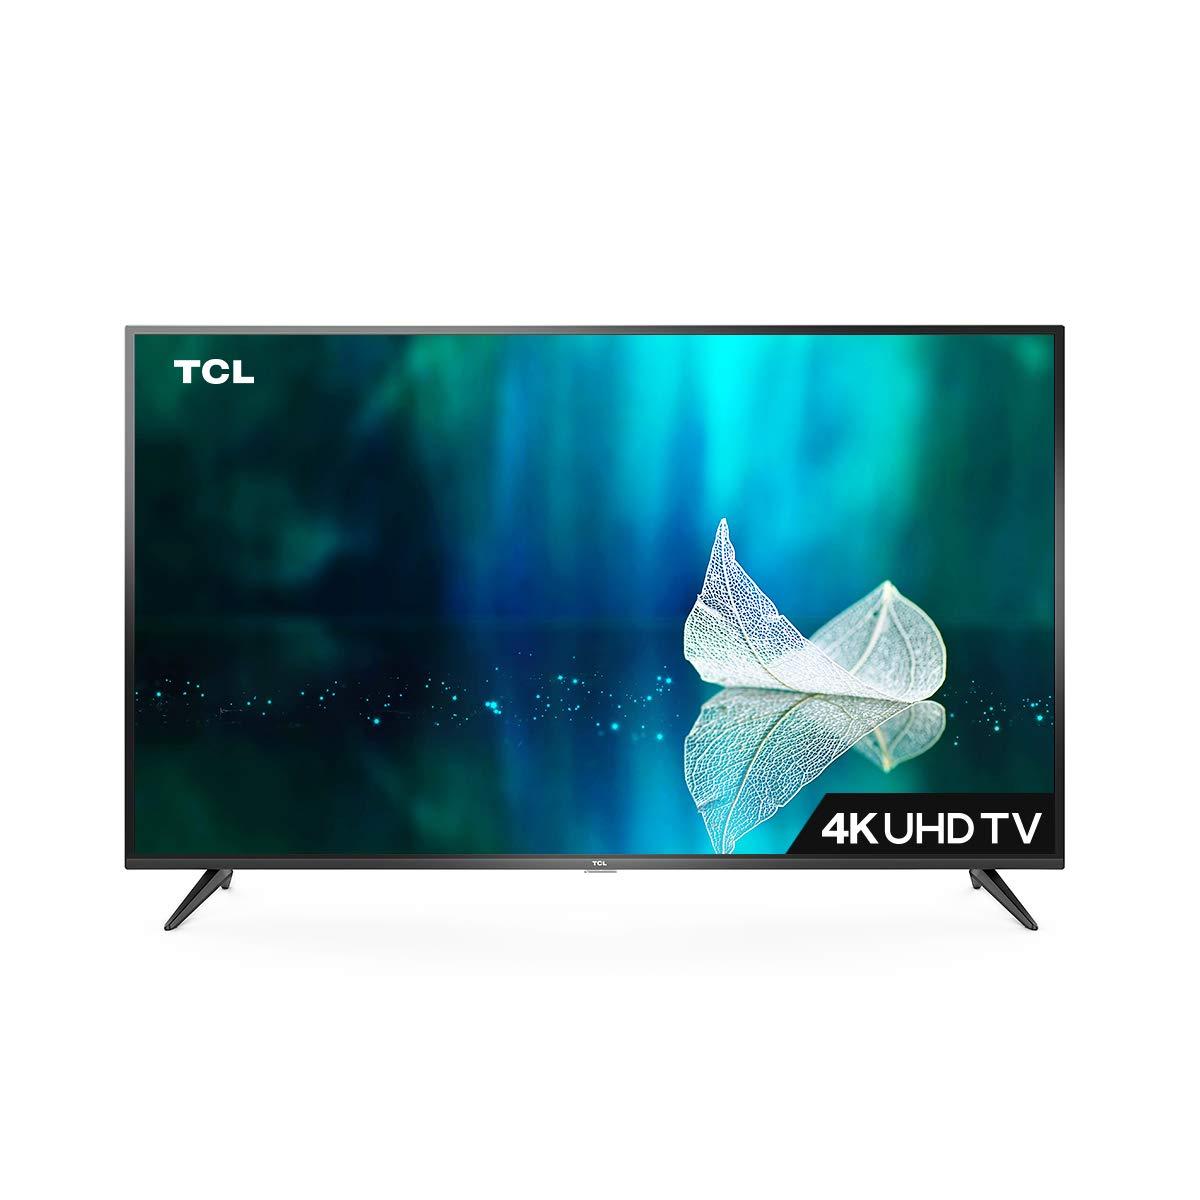 TCL 107.88 cm (43 inches) 4K Ultra HD Smart LED TV 43P65US-2019 (Black)